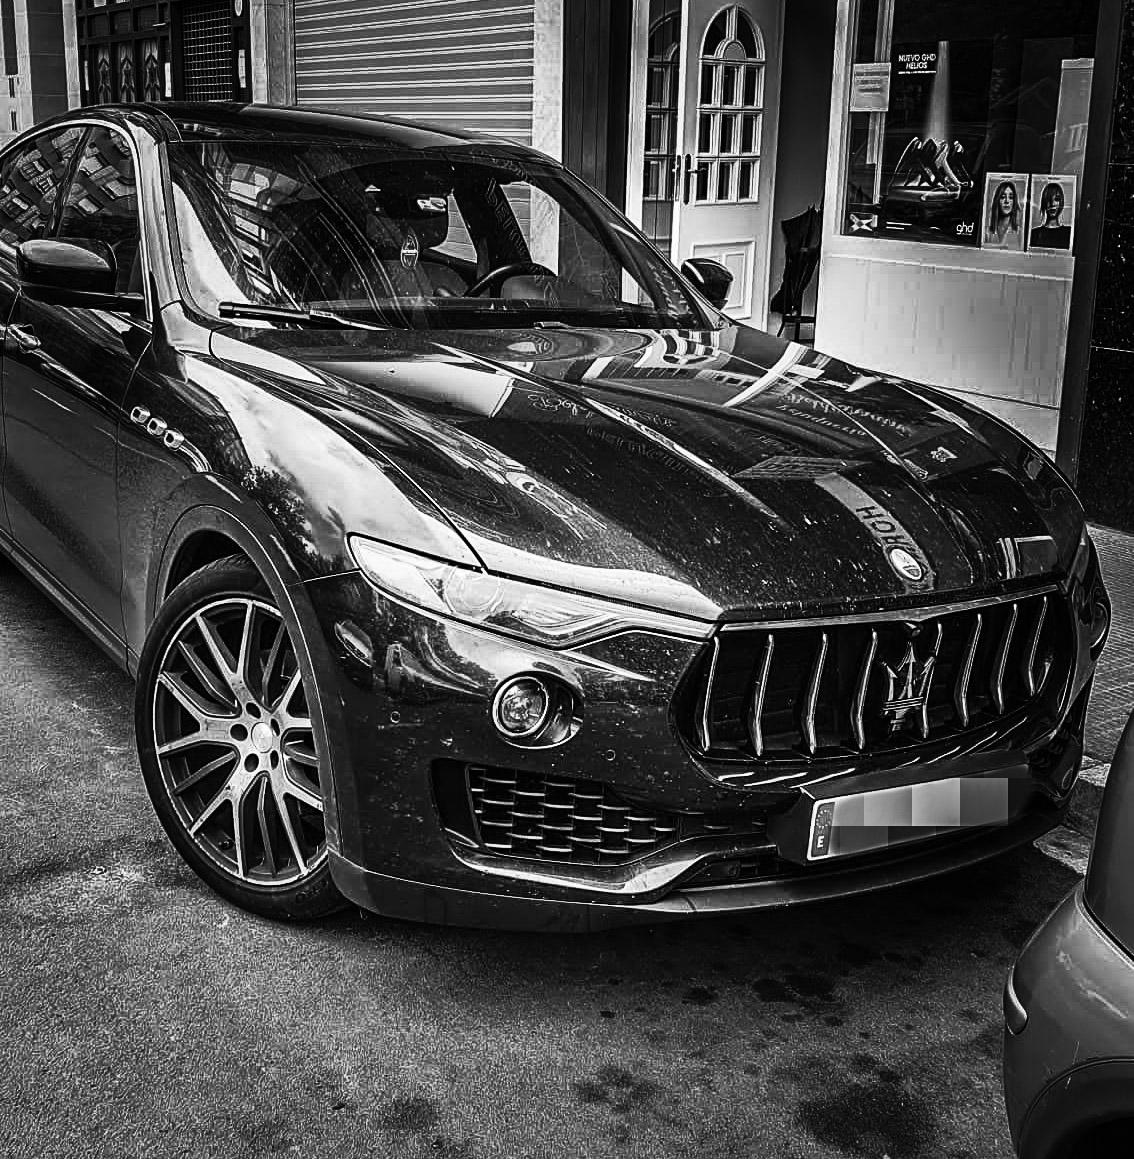 Maserati Levante Motores V6 Gasolina: 350 cv y 430cv V8 Gasolina  530cv y 580cv V6 Diésel 275cv Tracción AWD PRECIOS: 91800€ hasta 196.900€ + opiniones #maserati. #maseratilevante  #bhfyp  #maseratiquattroporte #maseratilife #pagani #maseraticlub #carlifestyle  #italiancars https://t.co/PSjw5EDVgC